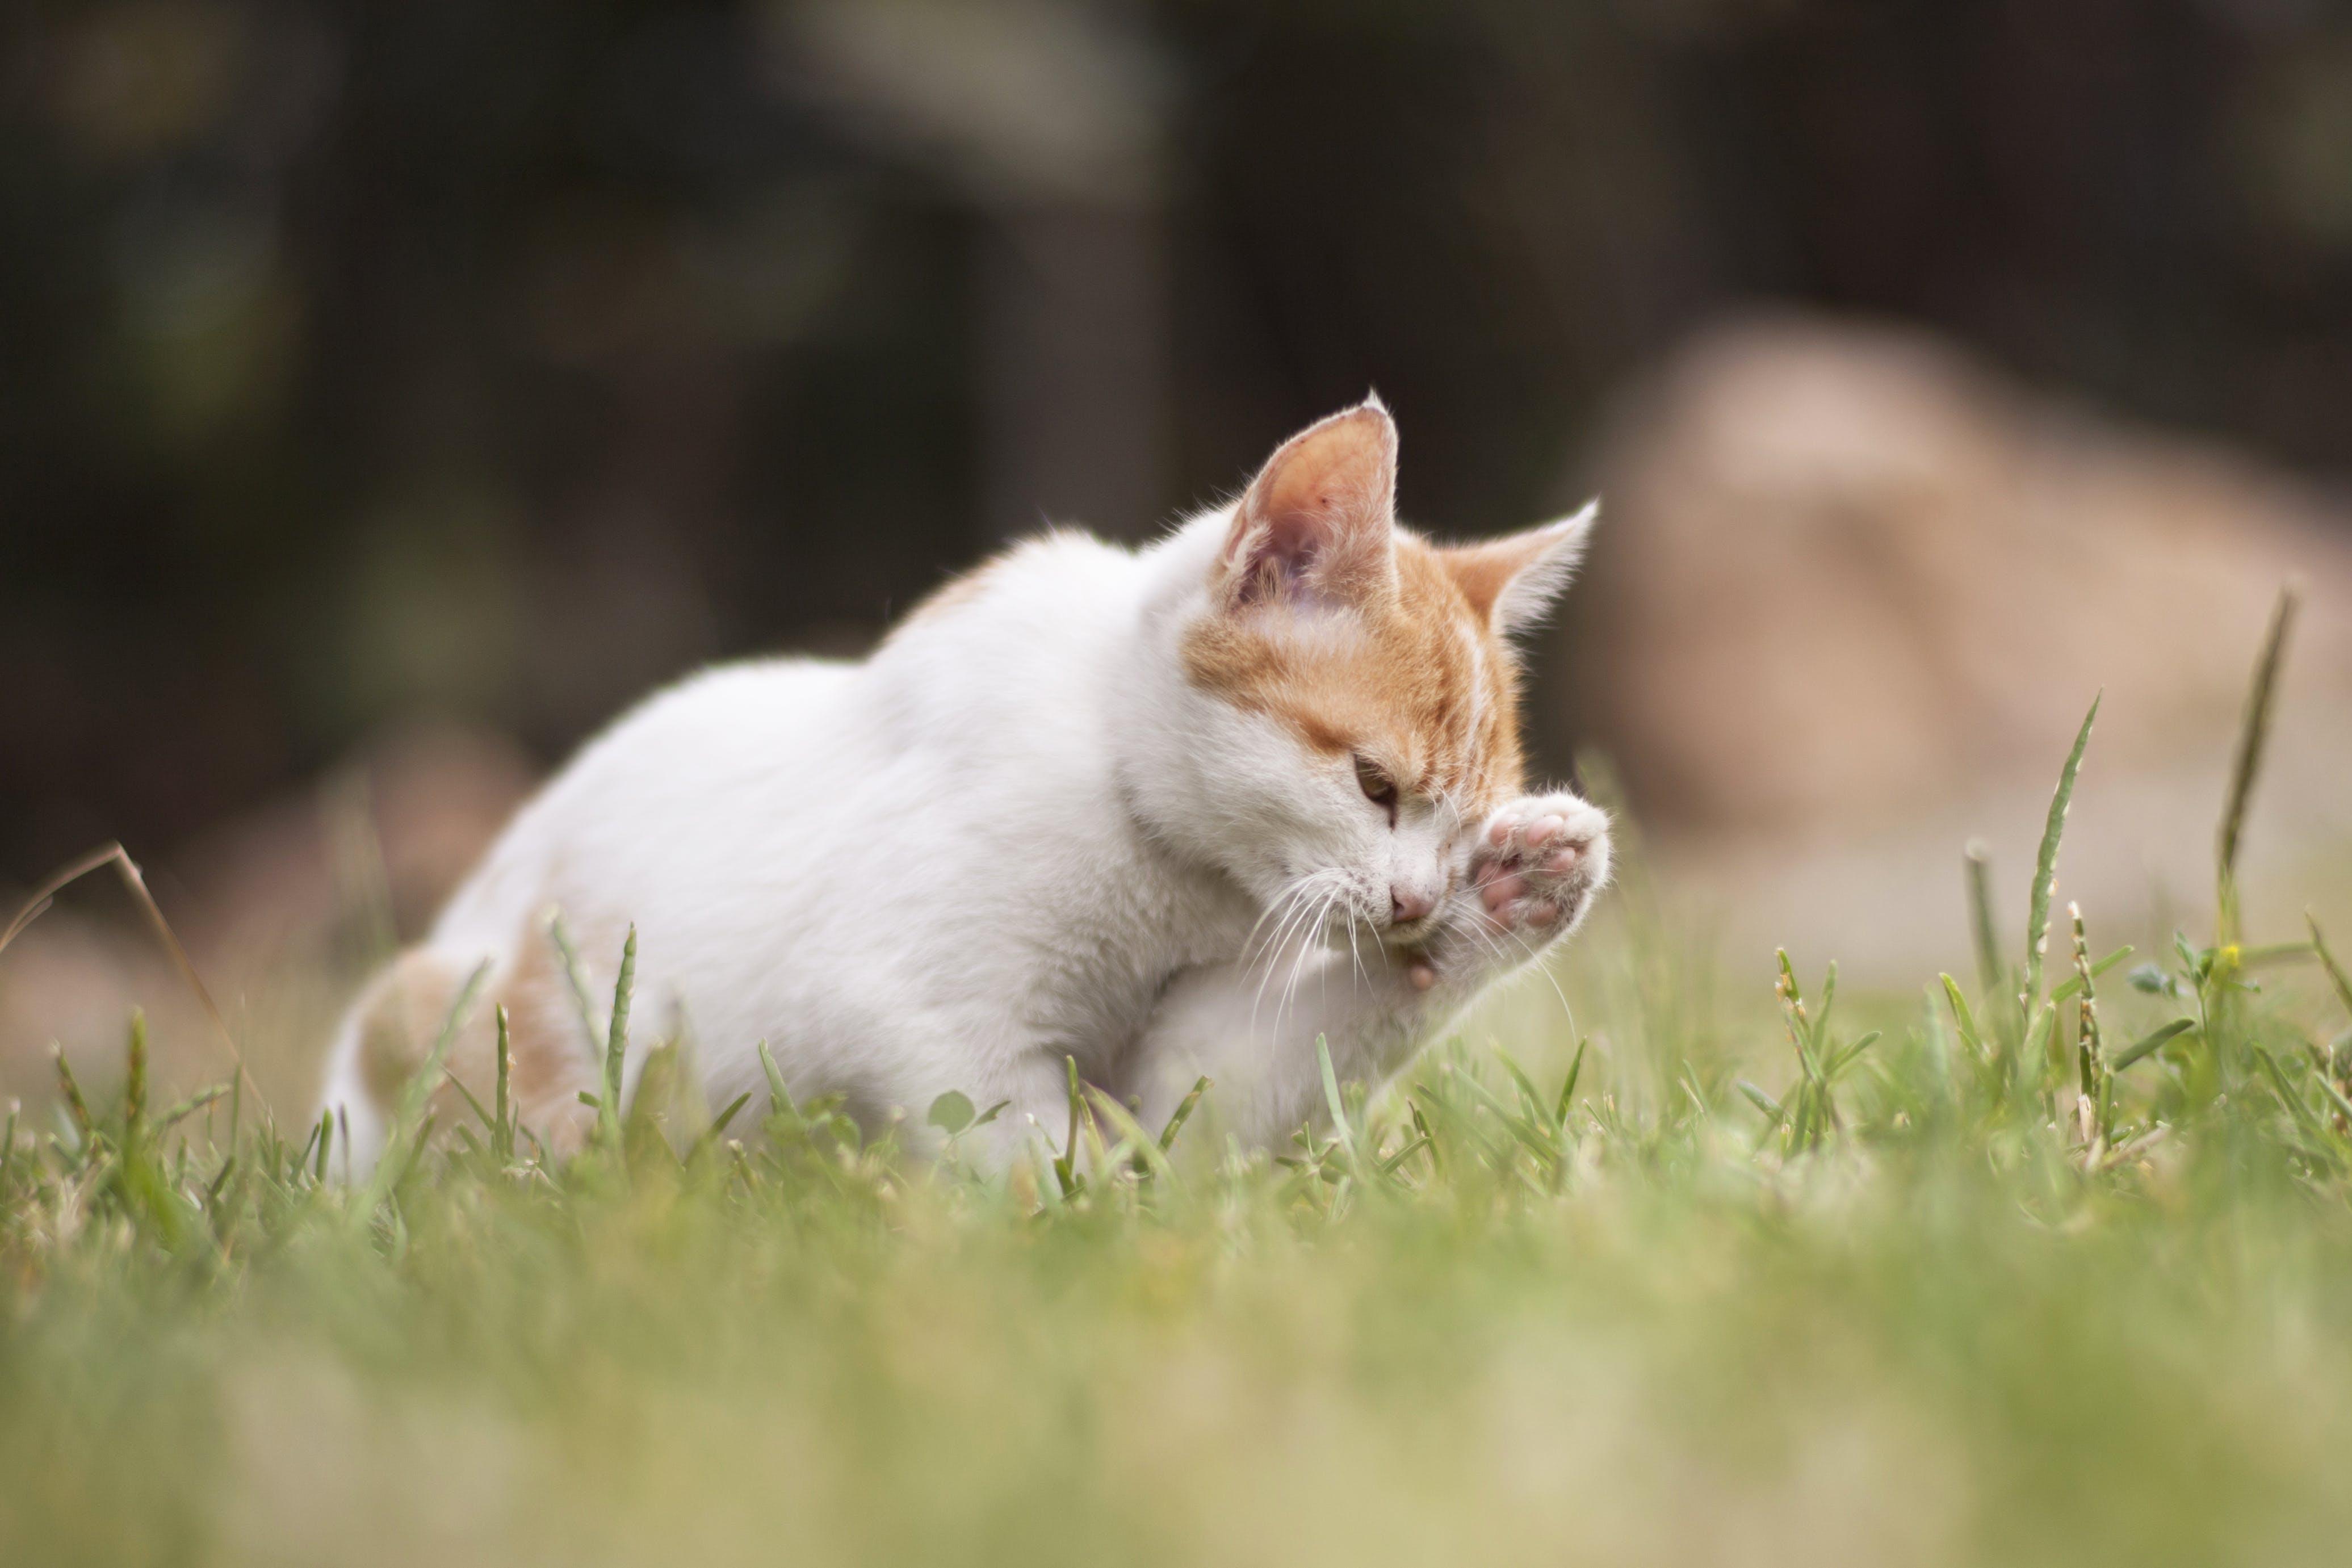 Foto d'estoc gratuïta de adorable, animal, animal domèstic, bufó